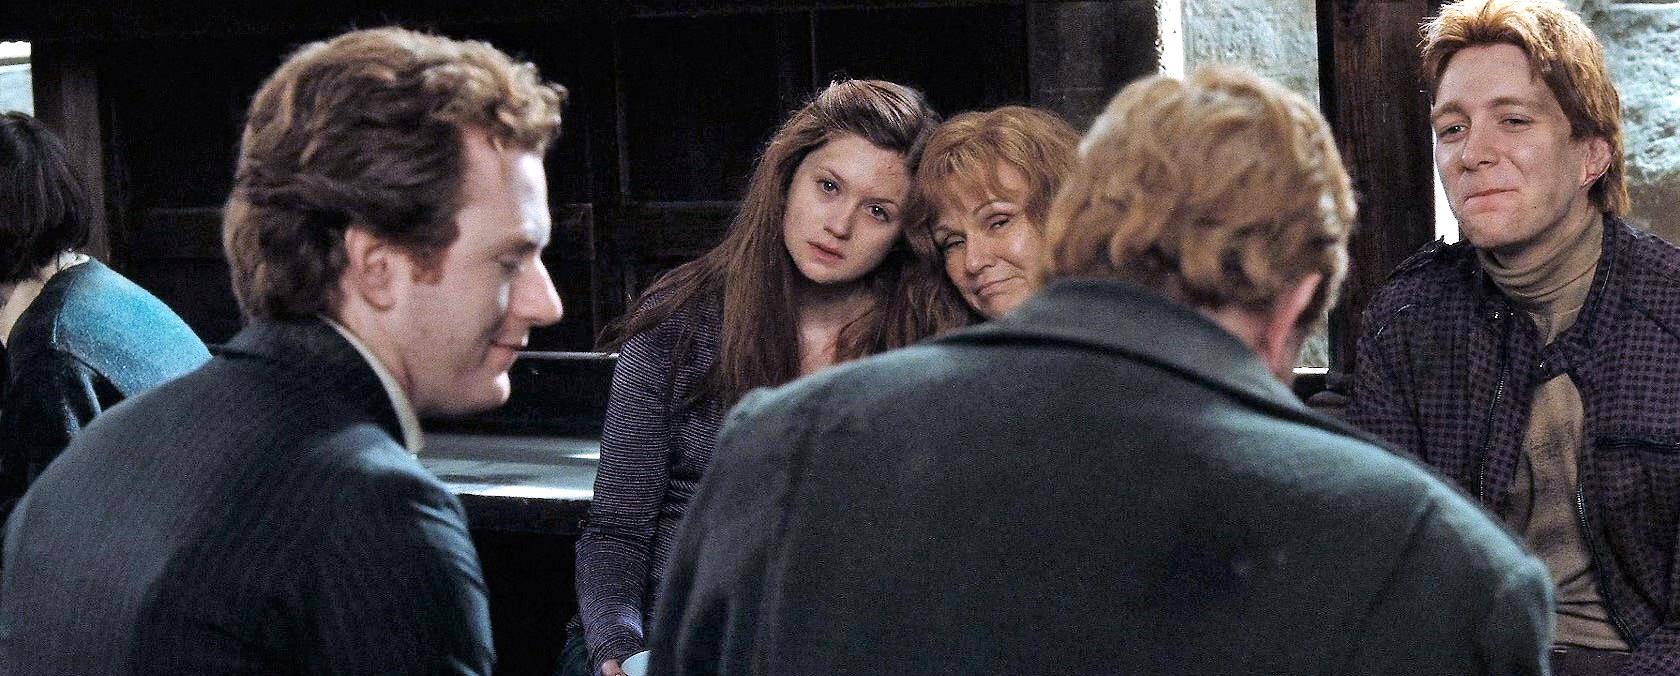 Percy Weasley | Harry Potter Wiki | FANDOM powered by Wikia